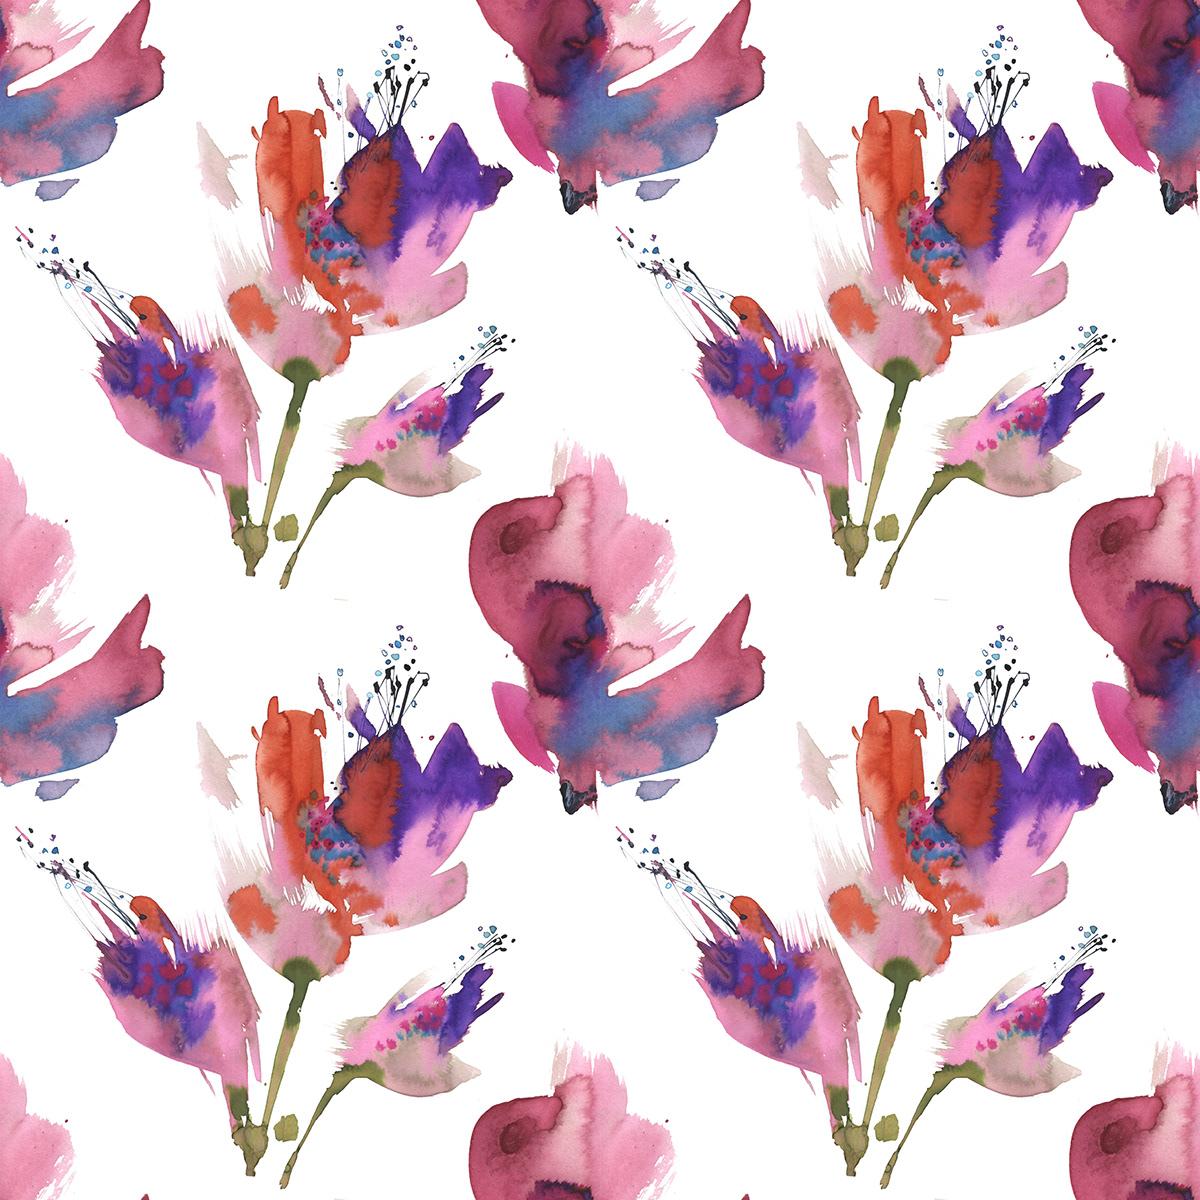 art paper Patterns prints wallpaper watercolor